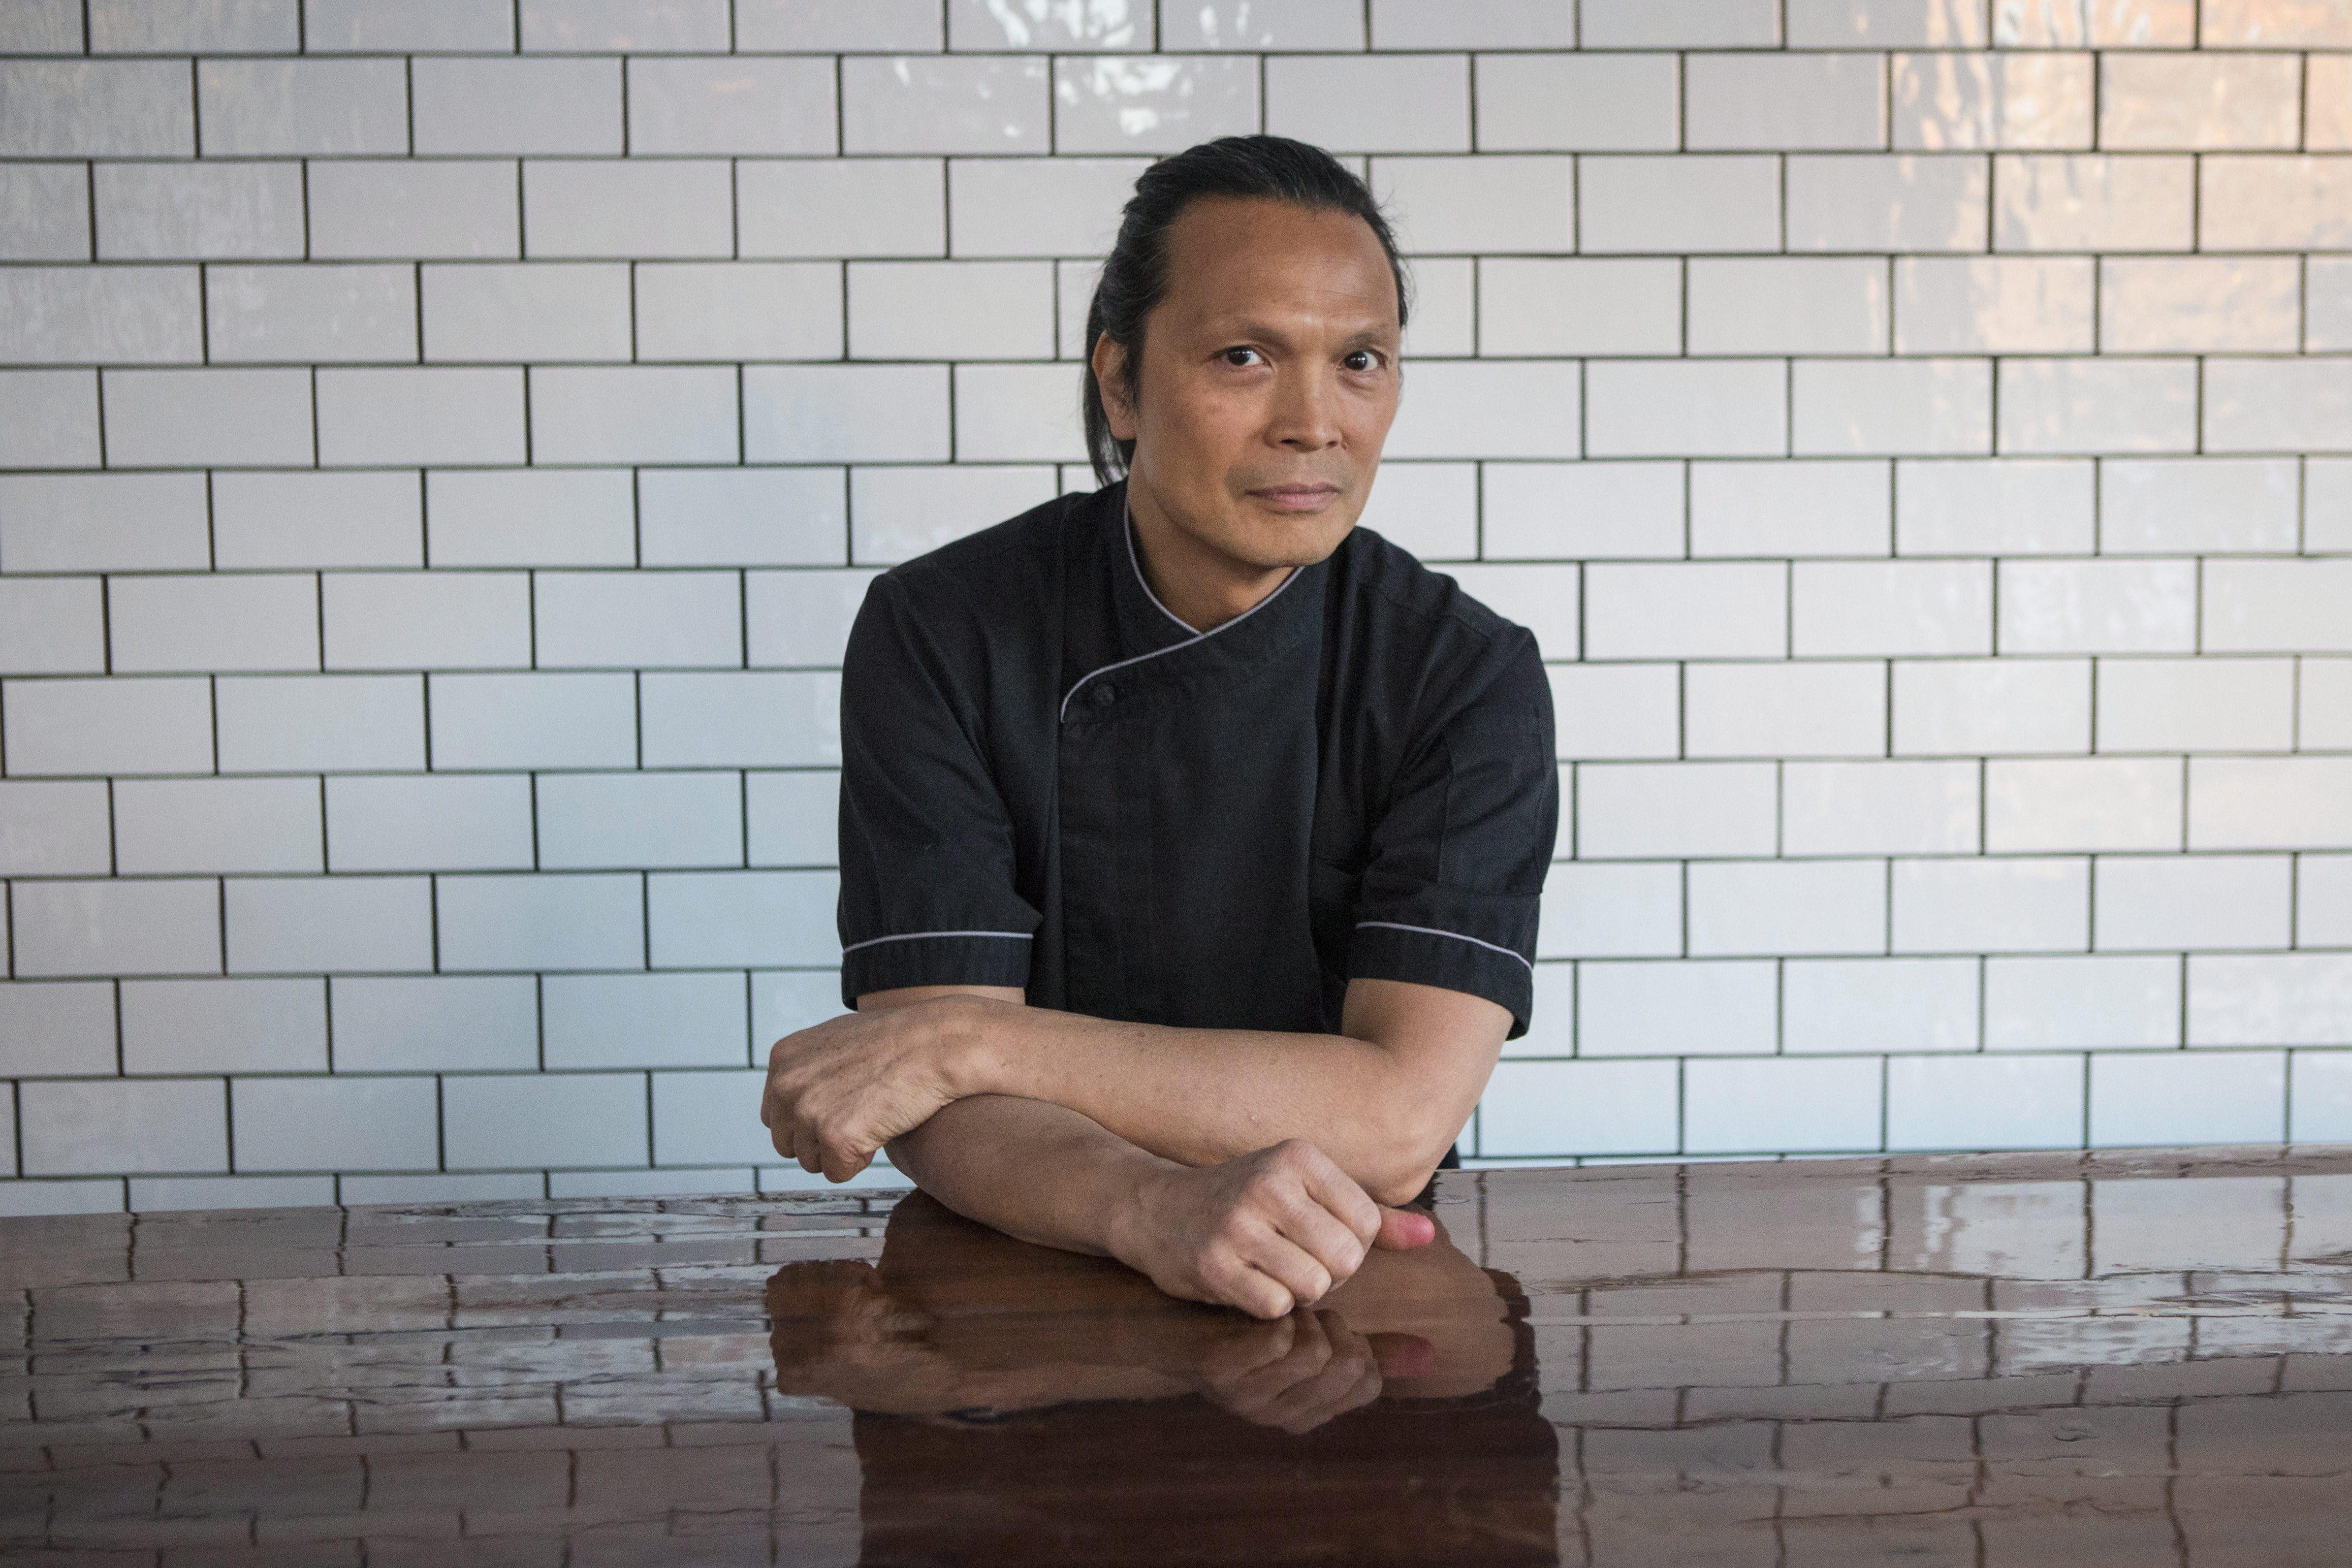 Chef Susur Lee at Bent restaurant in Toronto, 2013.